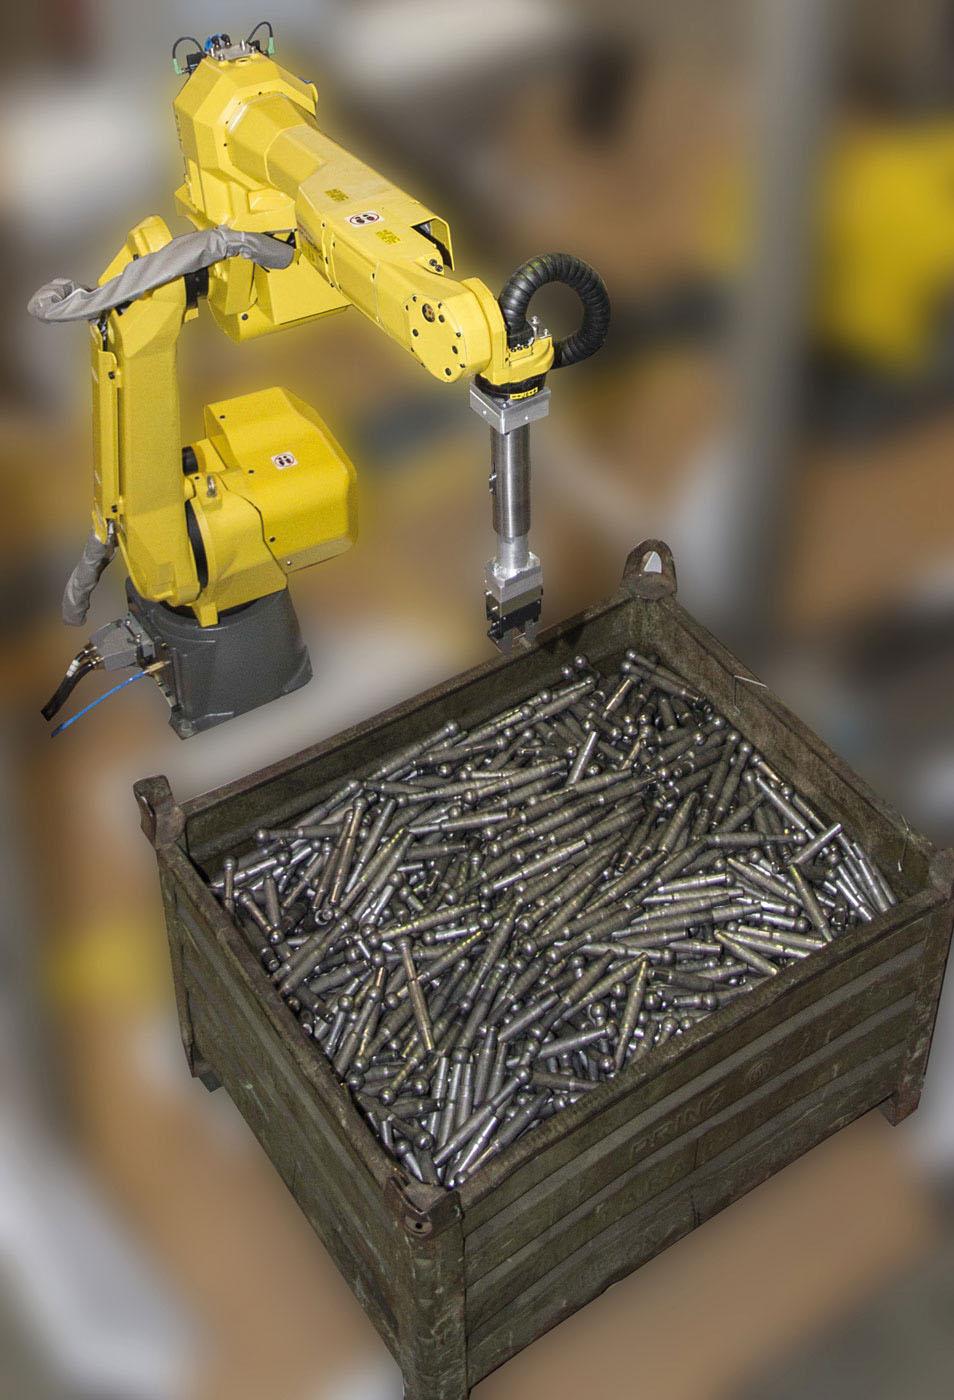 Grap in the box- Bin Picking